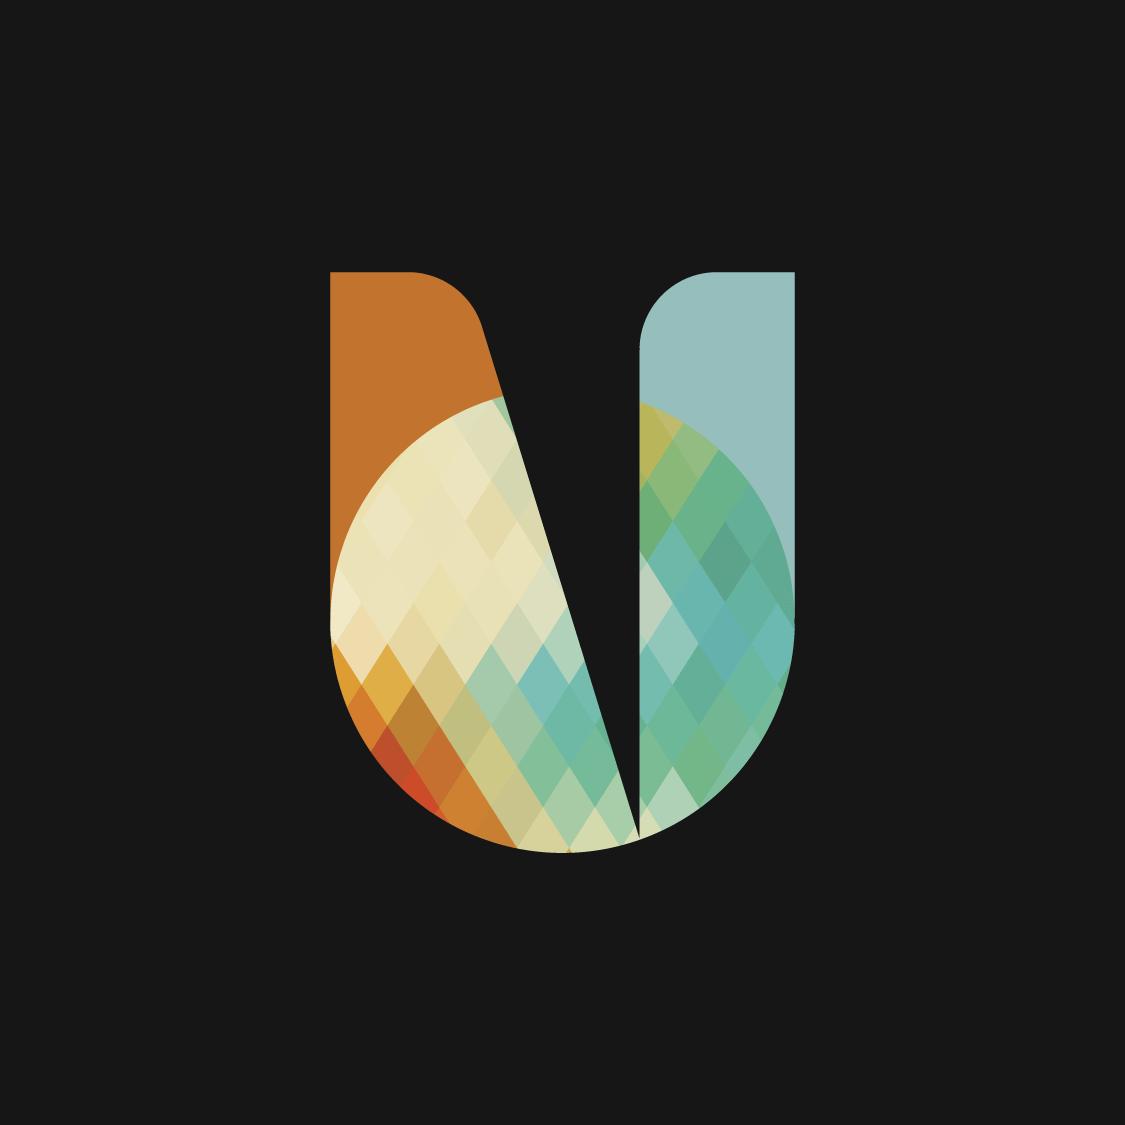 all-logos-2020-98_